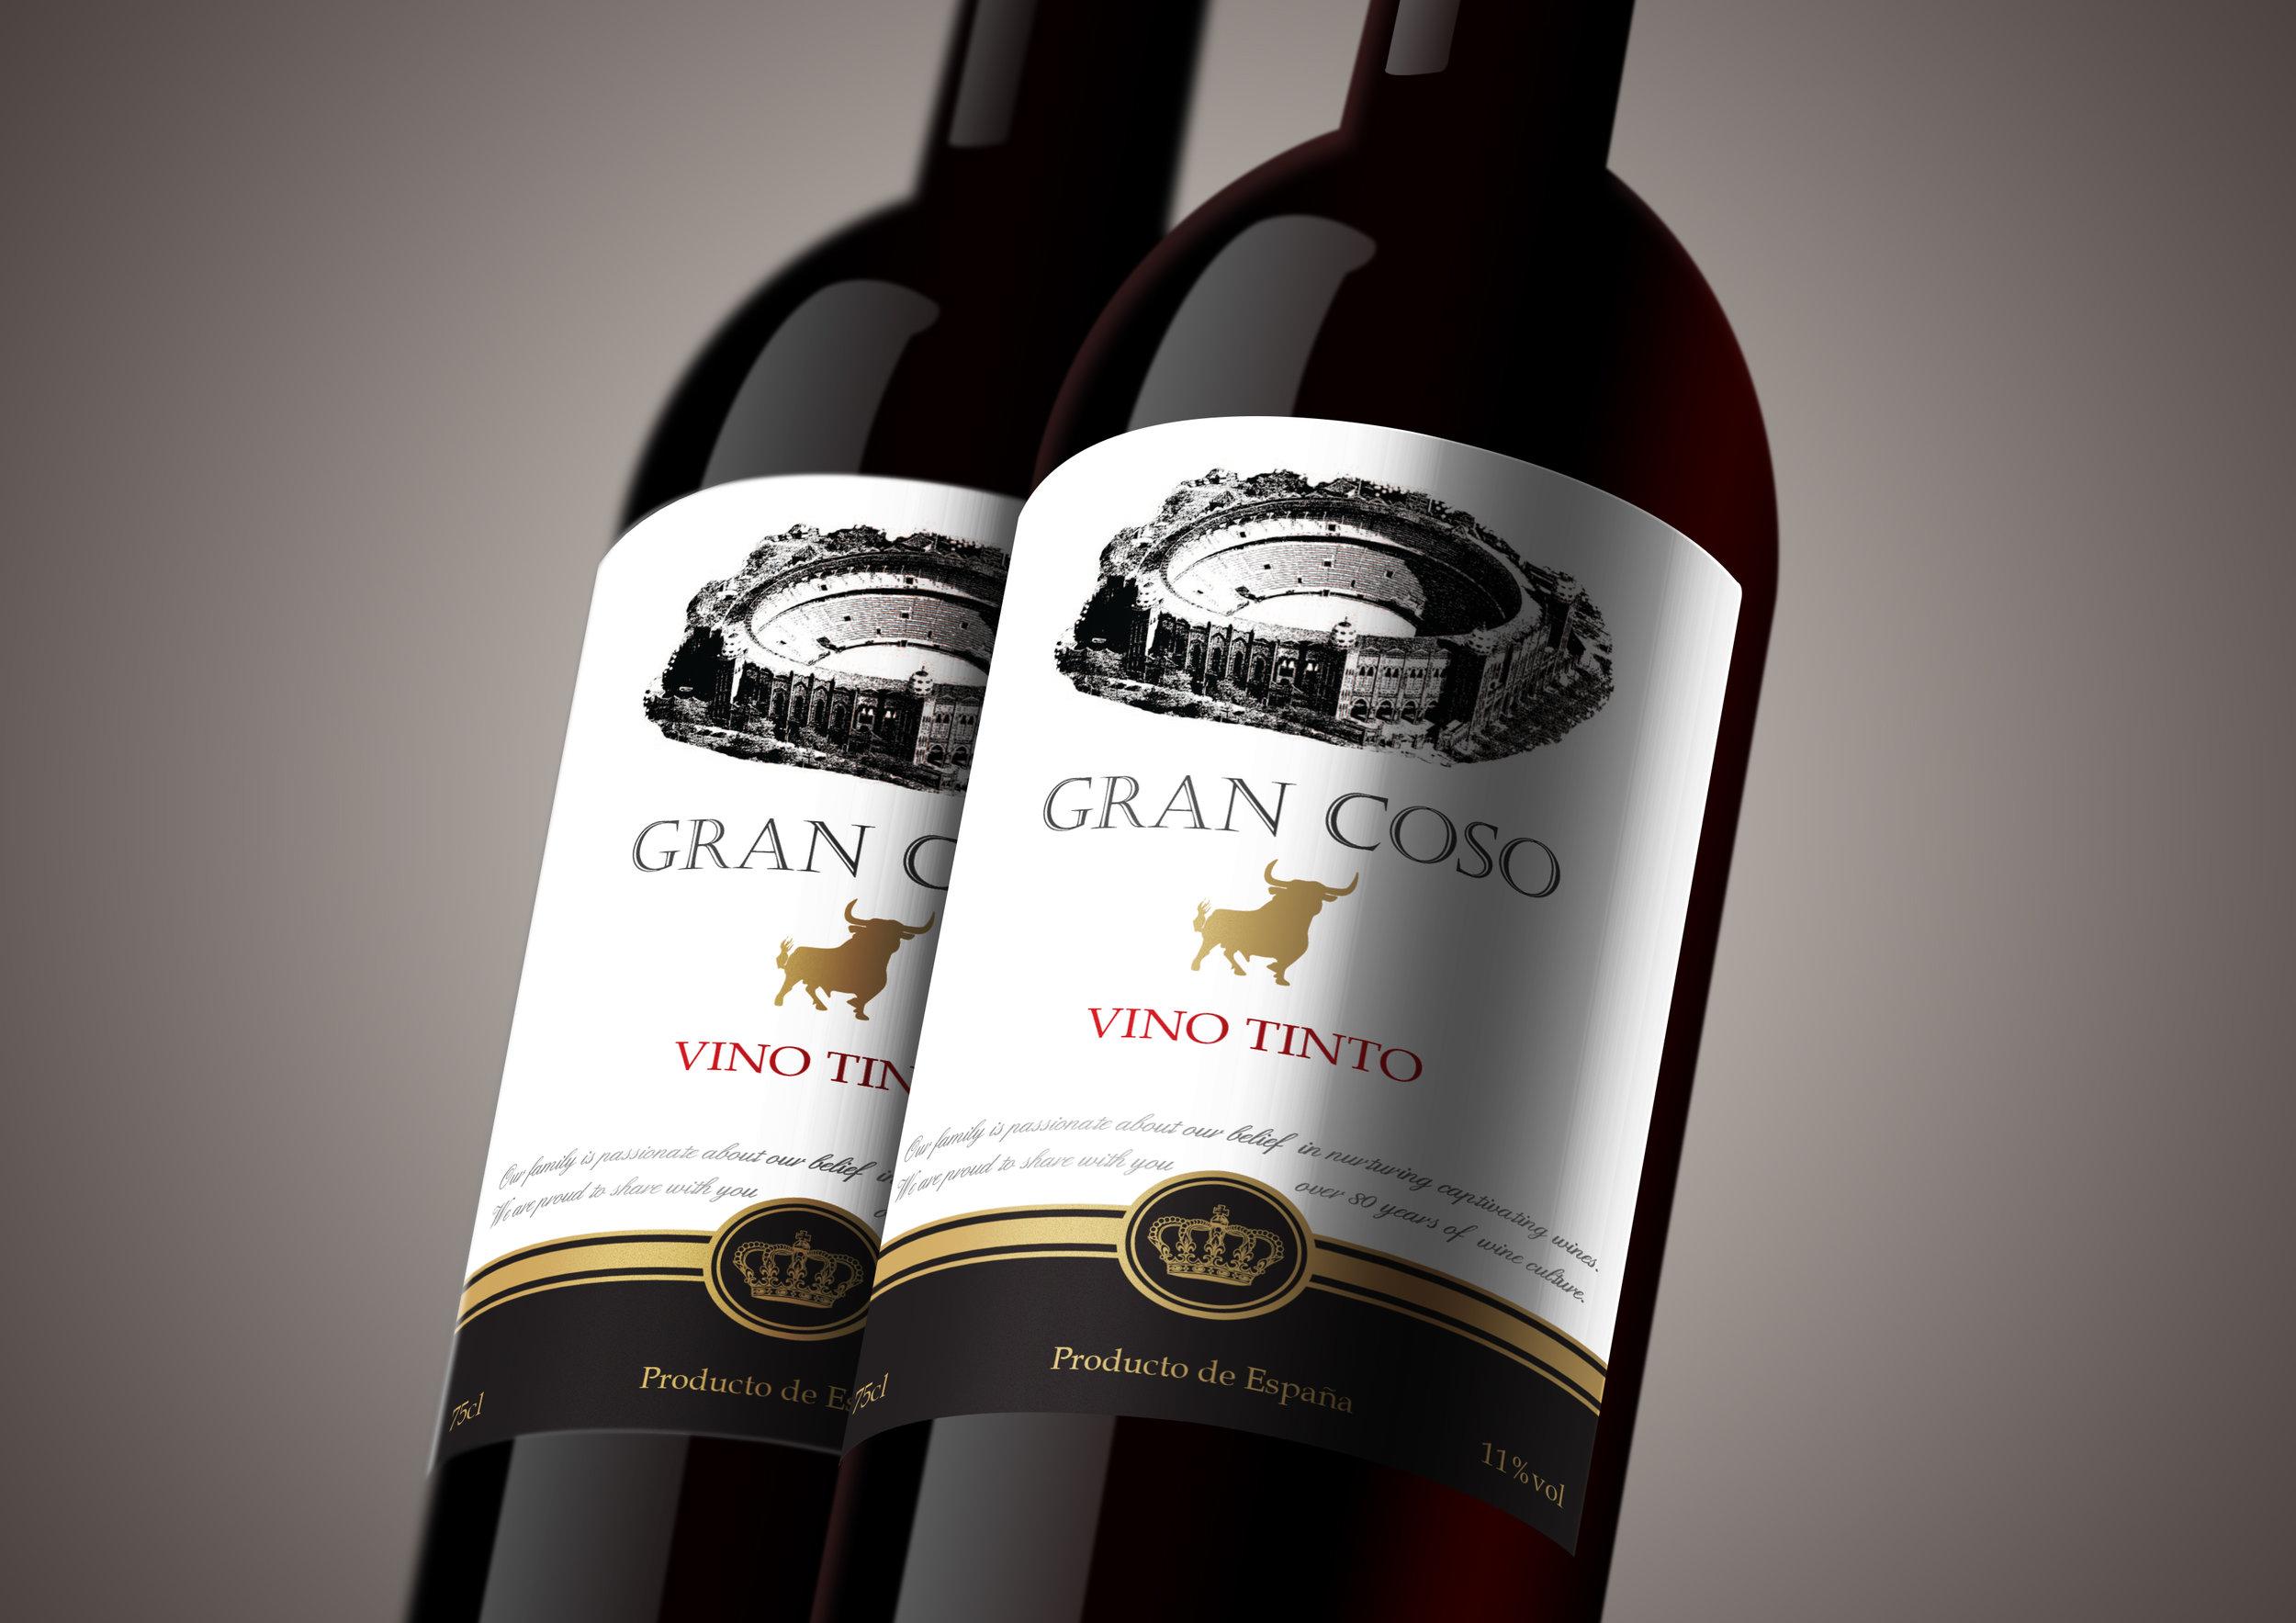 Gran Coso Vino Tinto 2 bottle shot.jpg